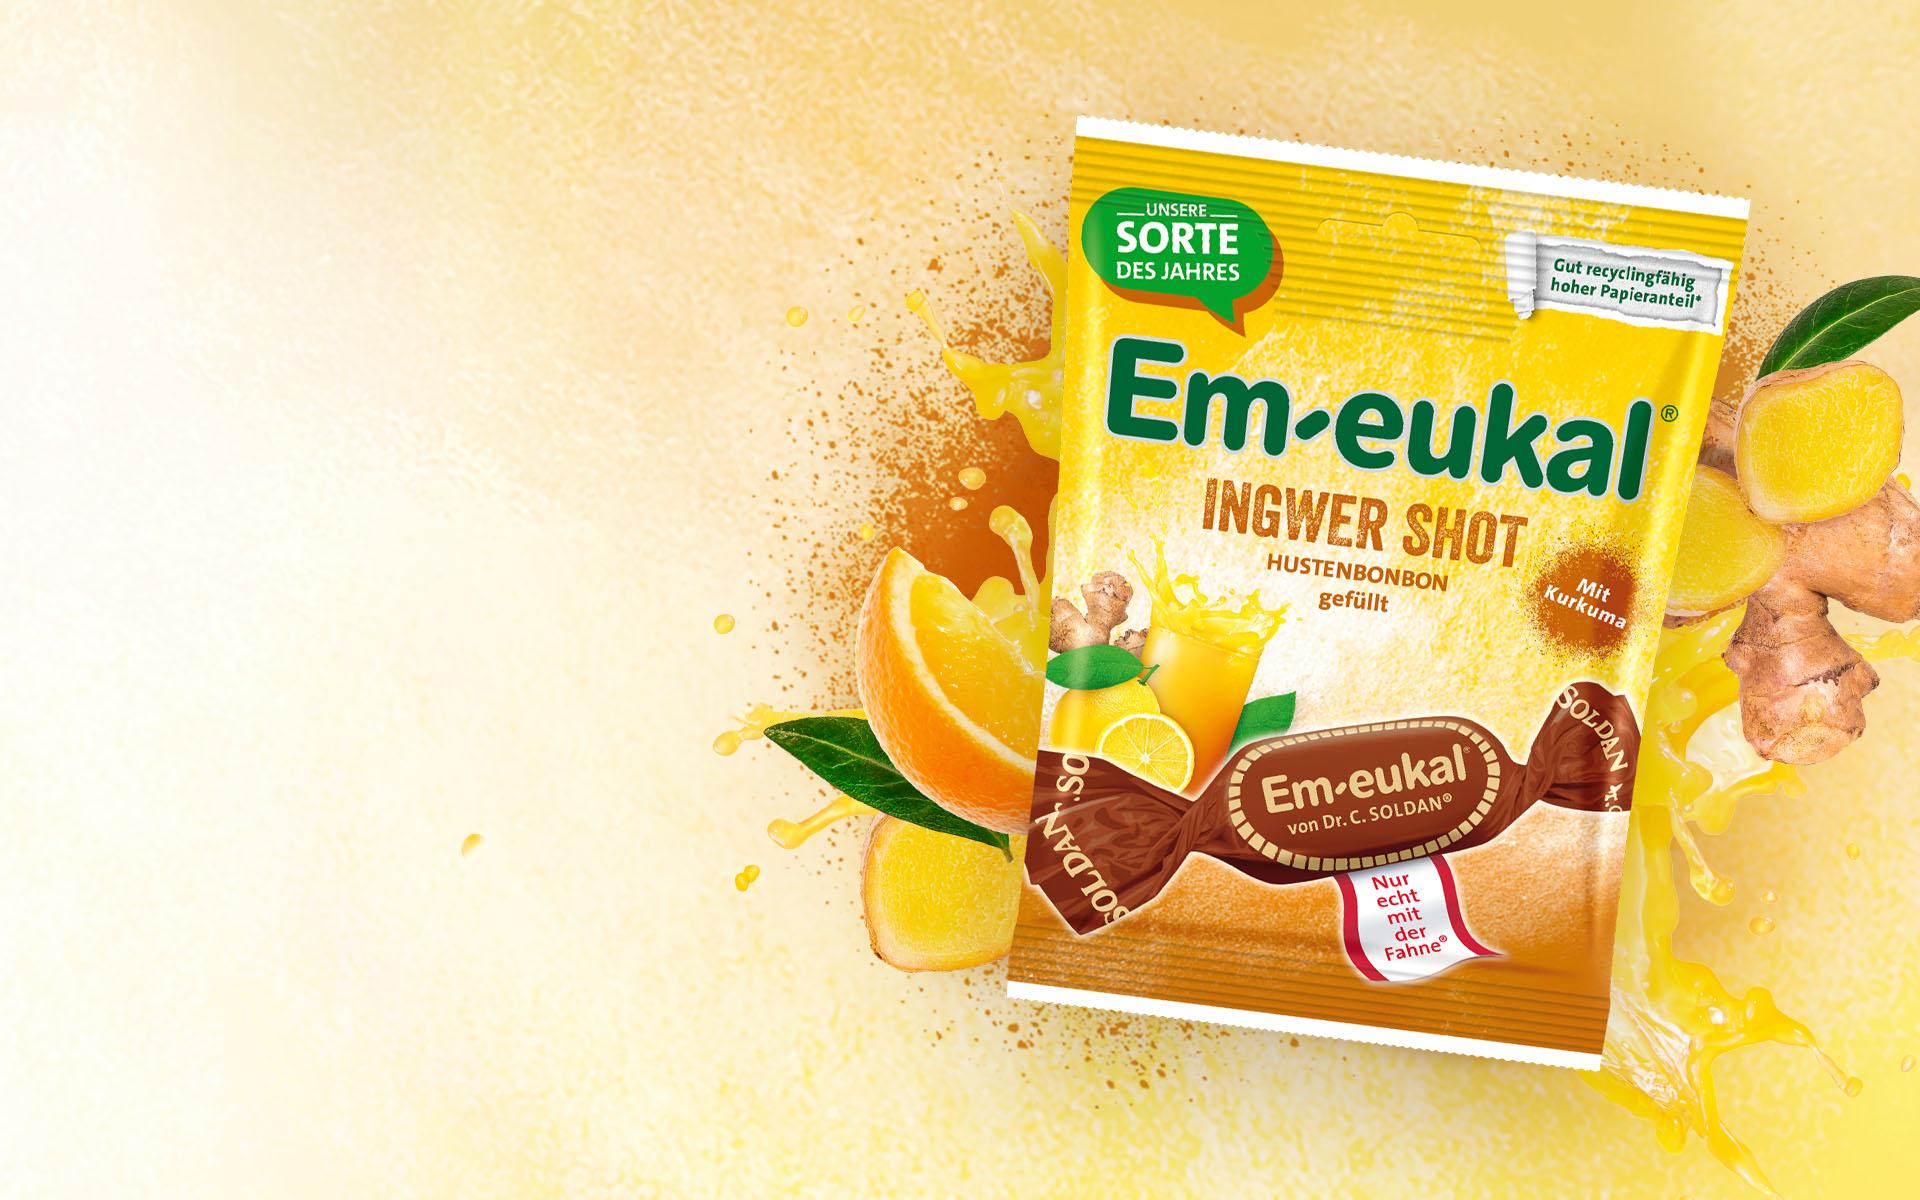 Ingwer Shot mit Kurkuma und Ingwer Em-eukal Zitrone